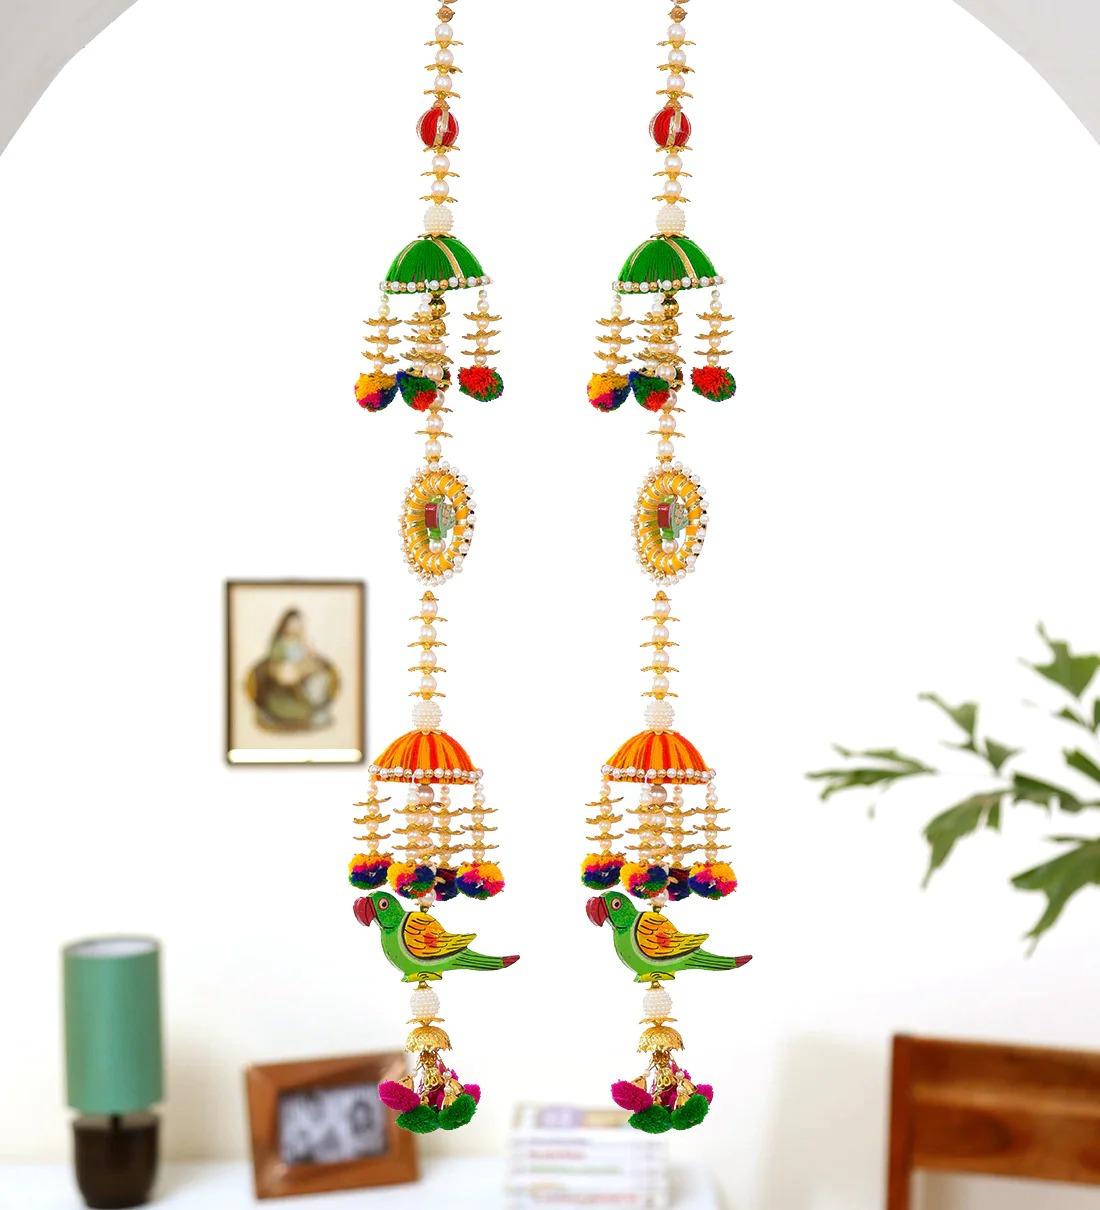 ganesh toran for home door , latest toran for main gate , designer toran for diwali , home decoration office decoration traditional bandarwal navratri , decoration for home, fancy wall hanging, toran puja pooja mandir low price